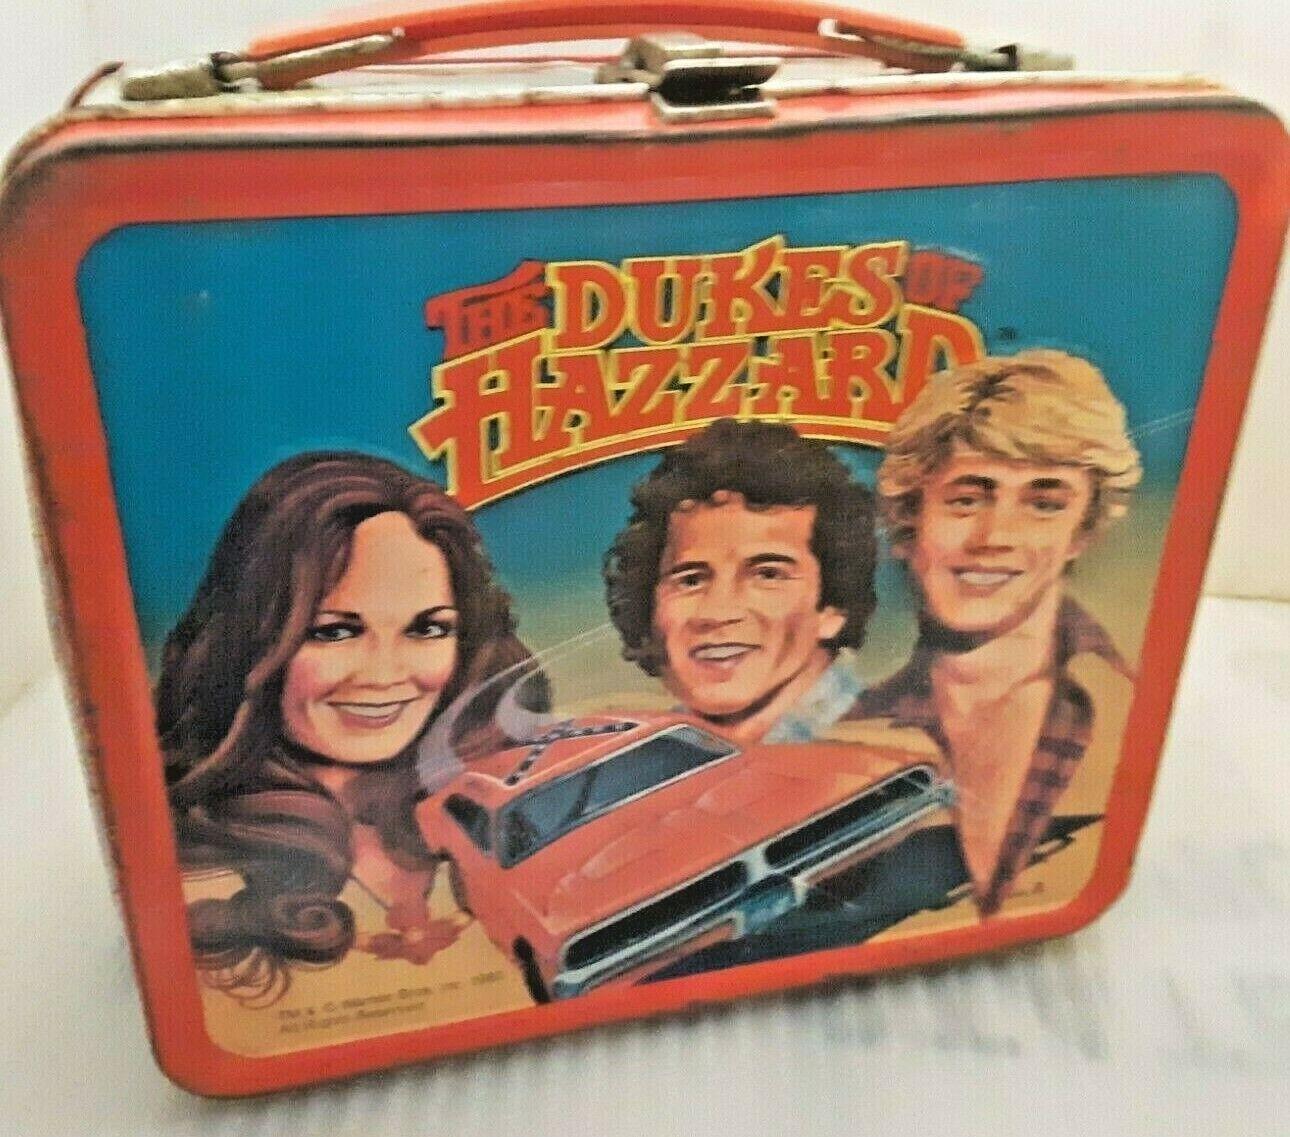 1980 Dukes of Hazzard Metal Lunch Box -  TV Show Lunchbox Ju